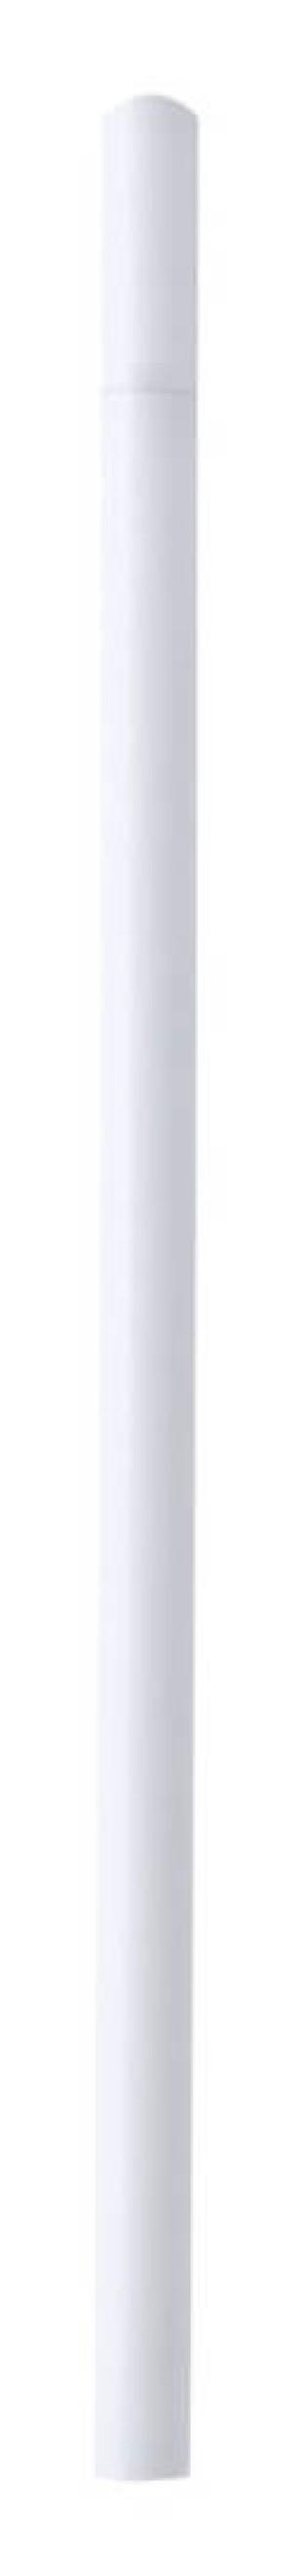 Koby tužka z recyklovaného papíru